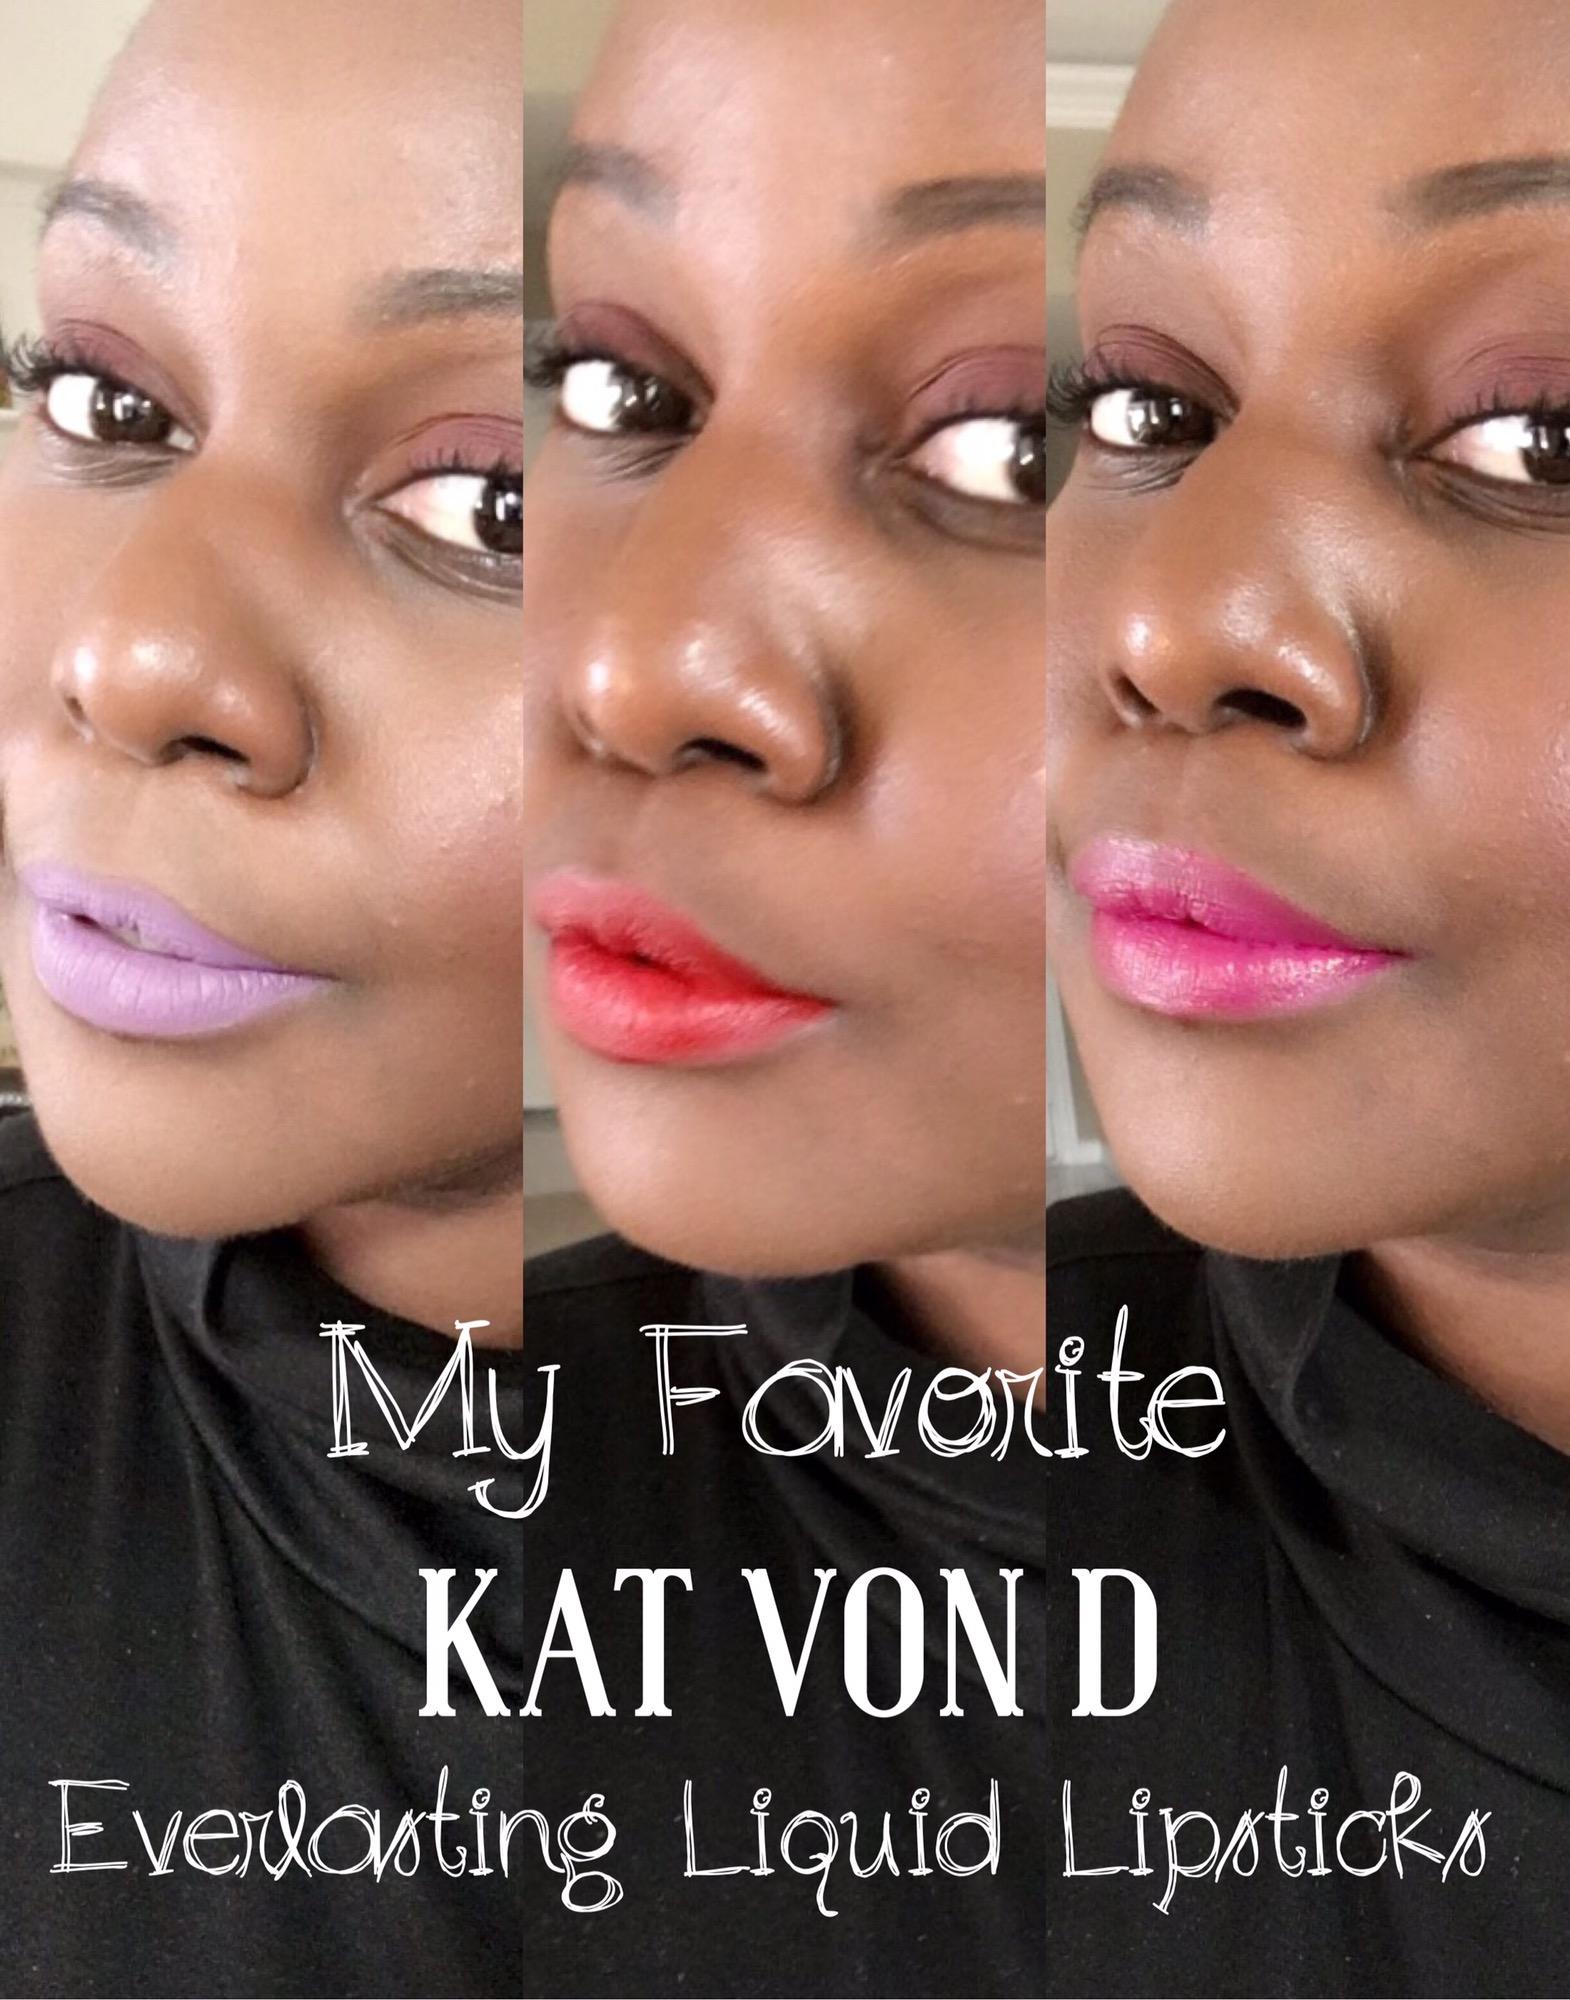 Kat Von D Everlasting Liquid Lipsticks Review on Dark Skin Black Women of color